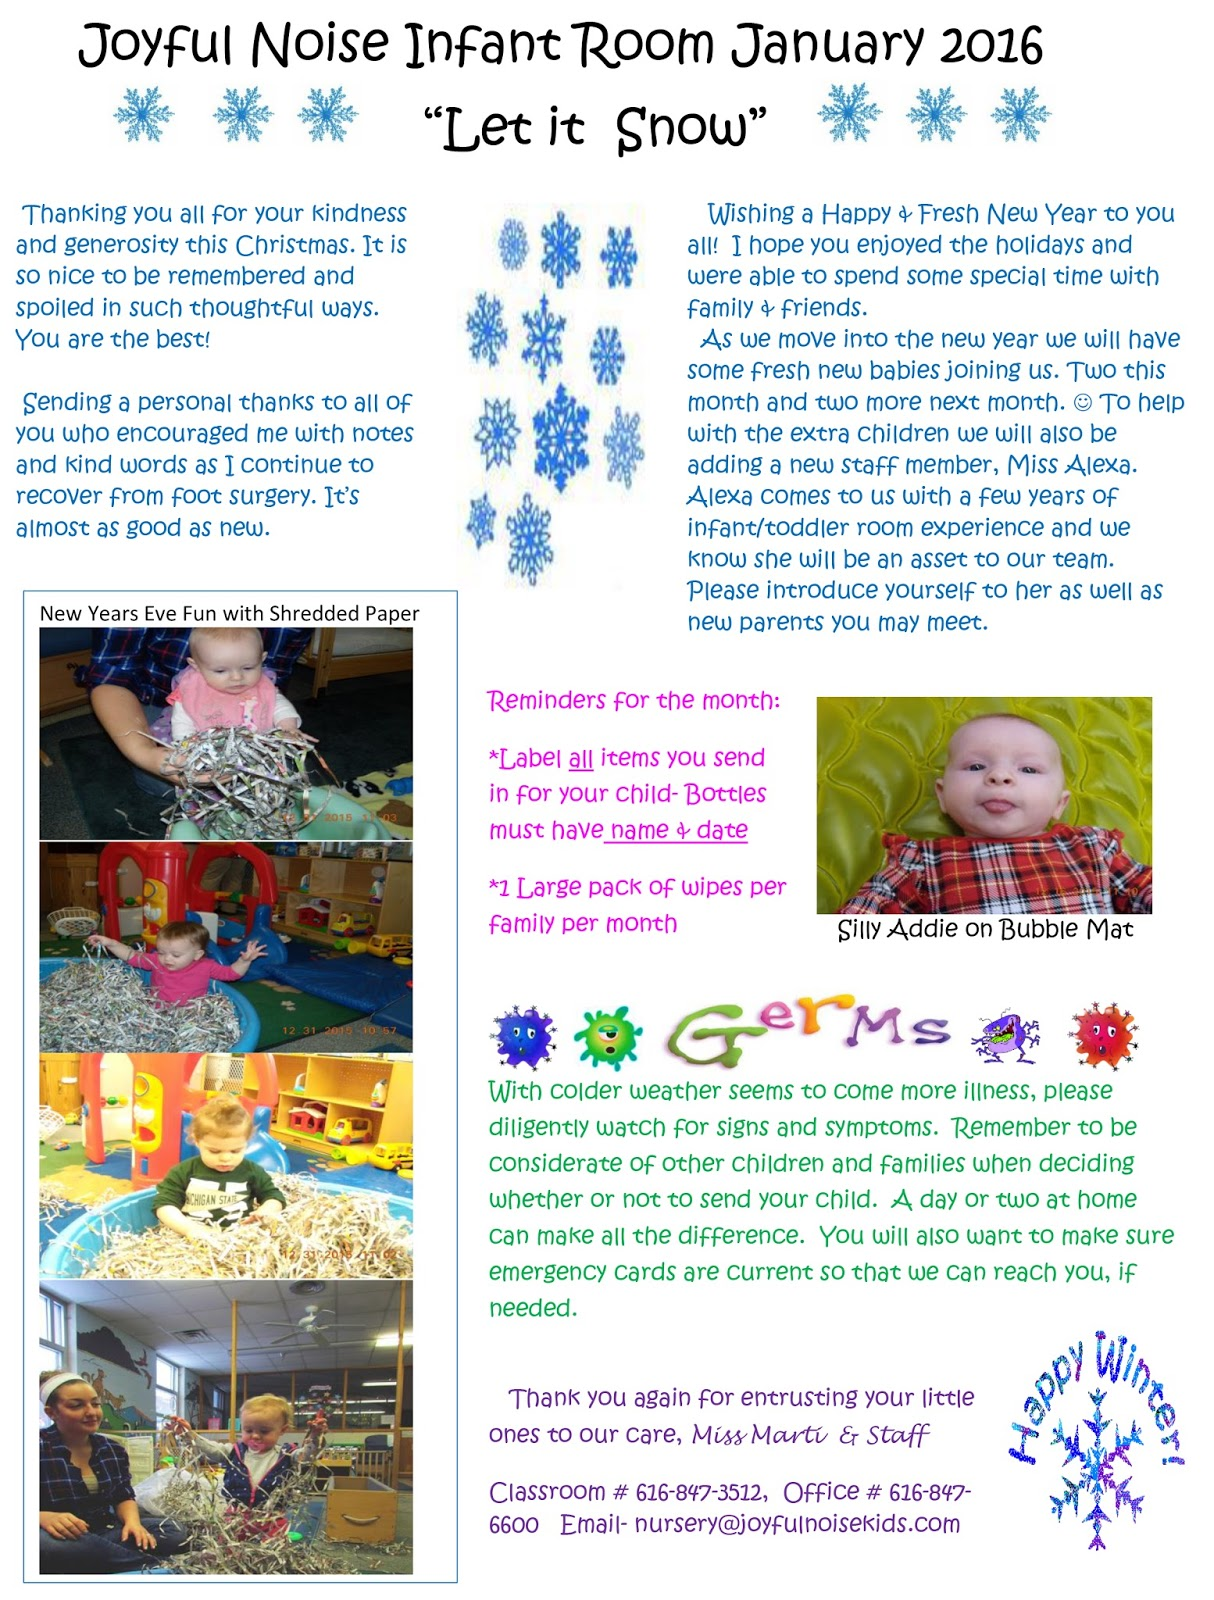 Daily Calendar December 2013 Tamil Daily Calendar 2018 2017 2016 2015 2014 2007 Infant Room News January 2016 Newsletter